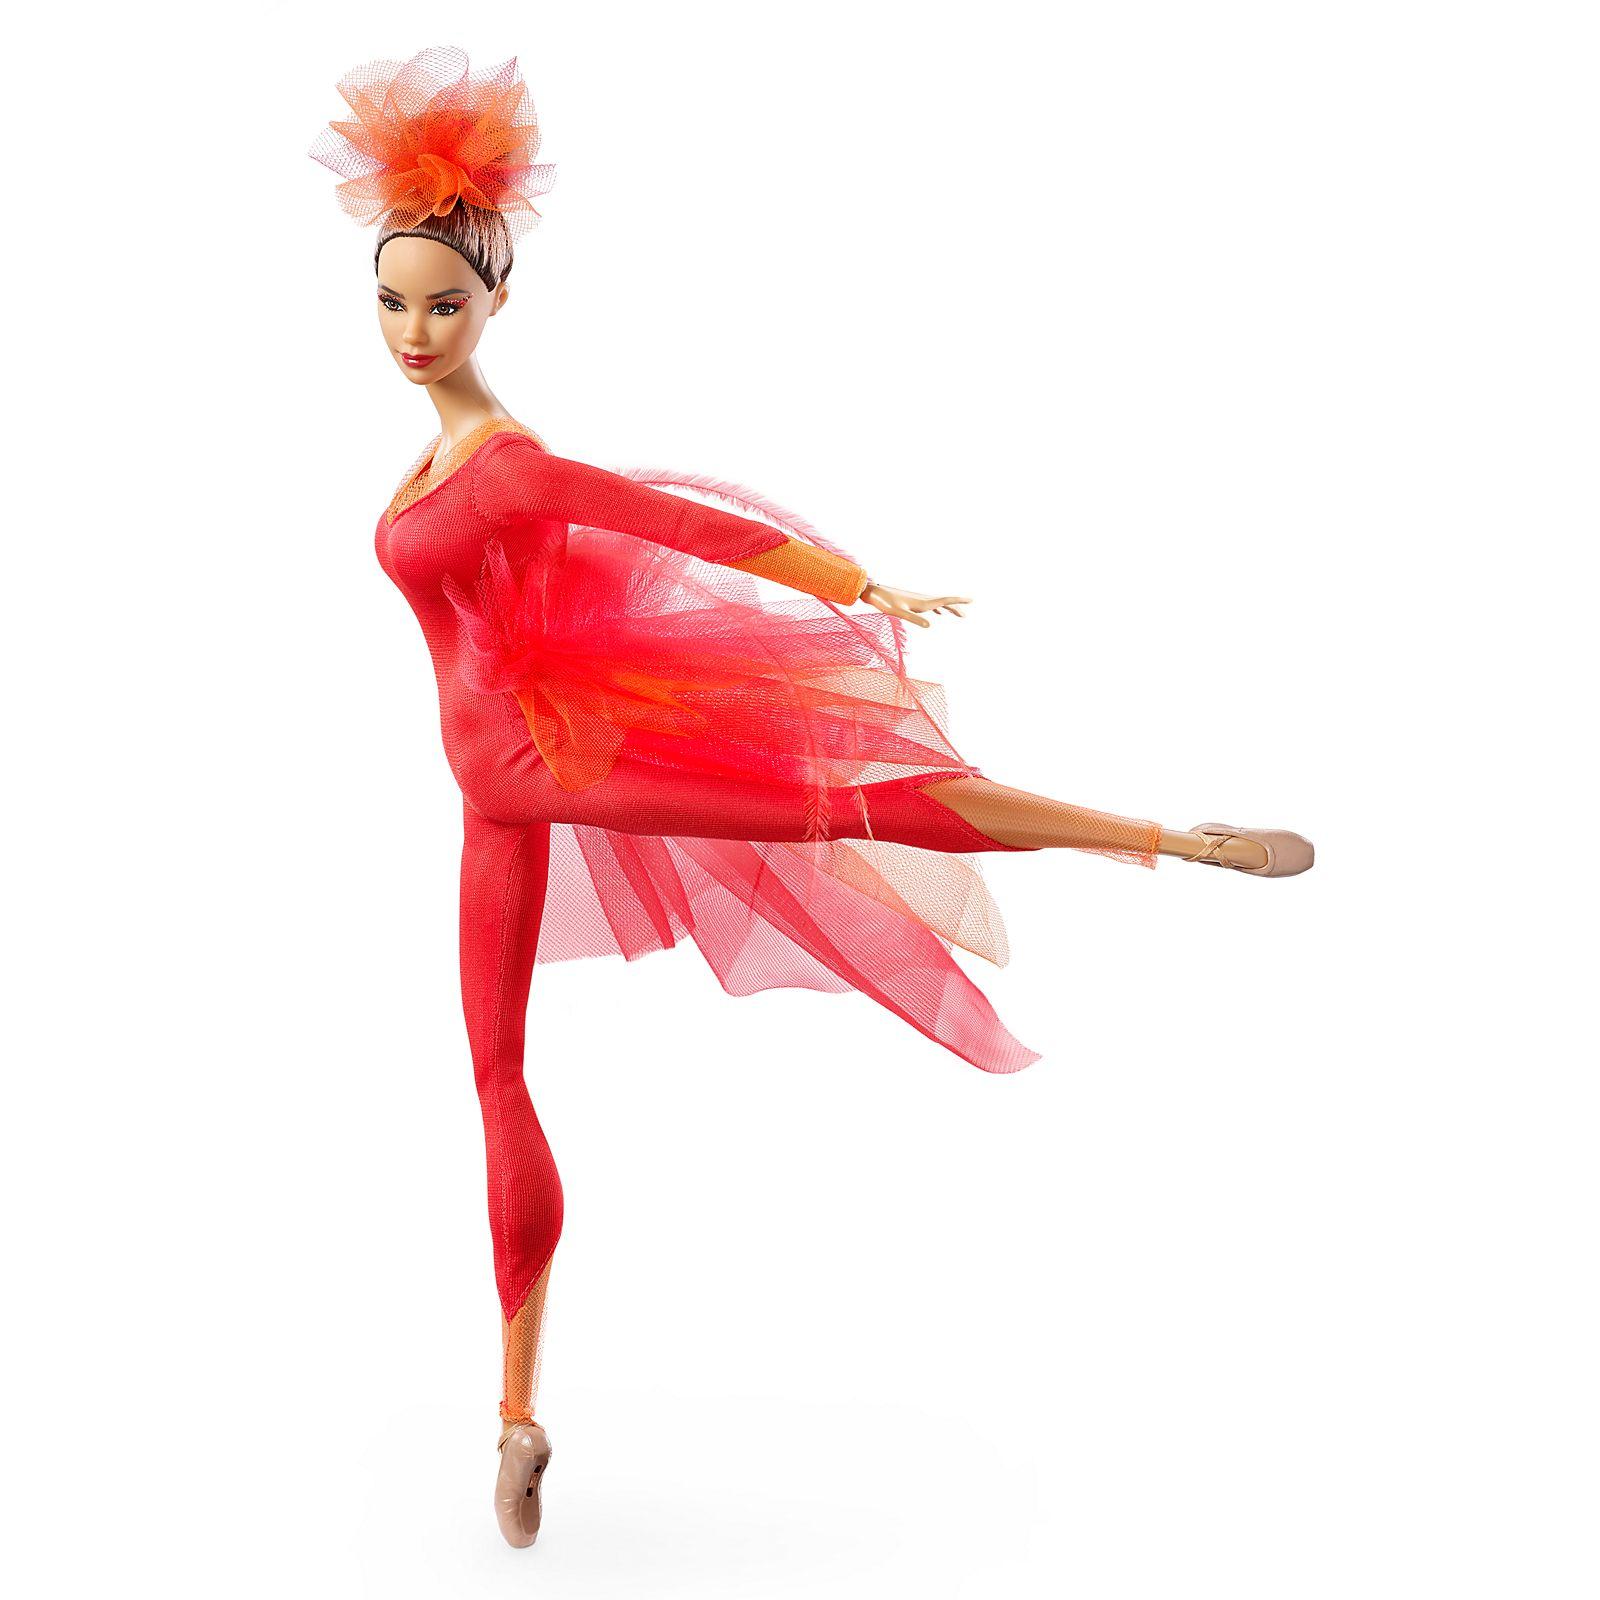 The Misty Copeland doll by Mattel